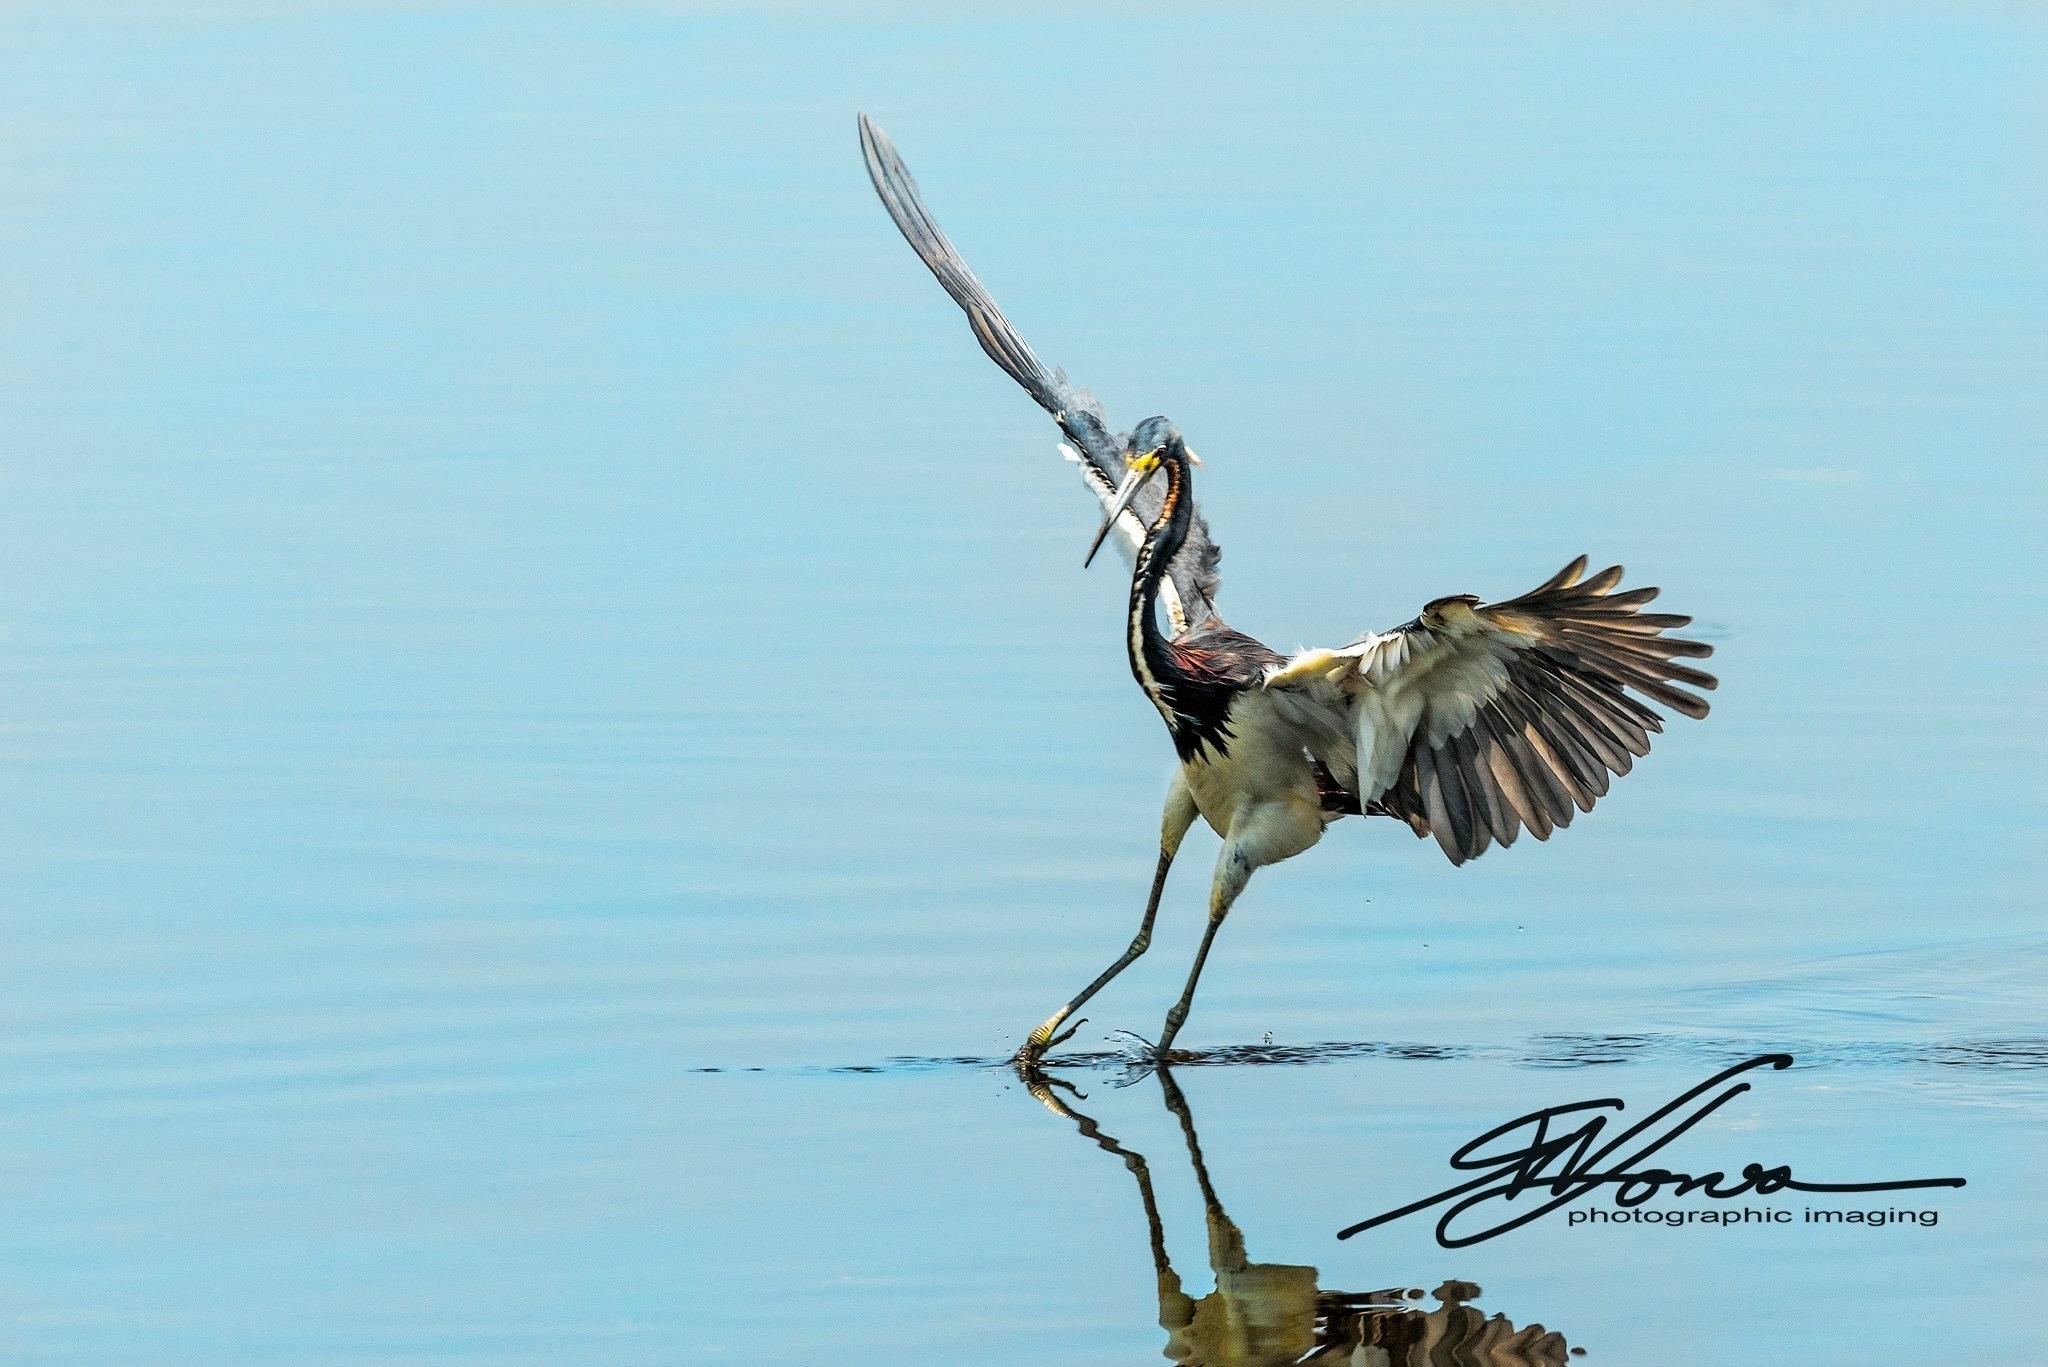 Tricolored Heron by gwjones317